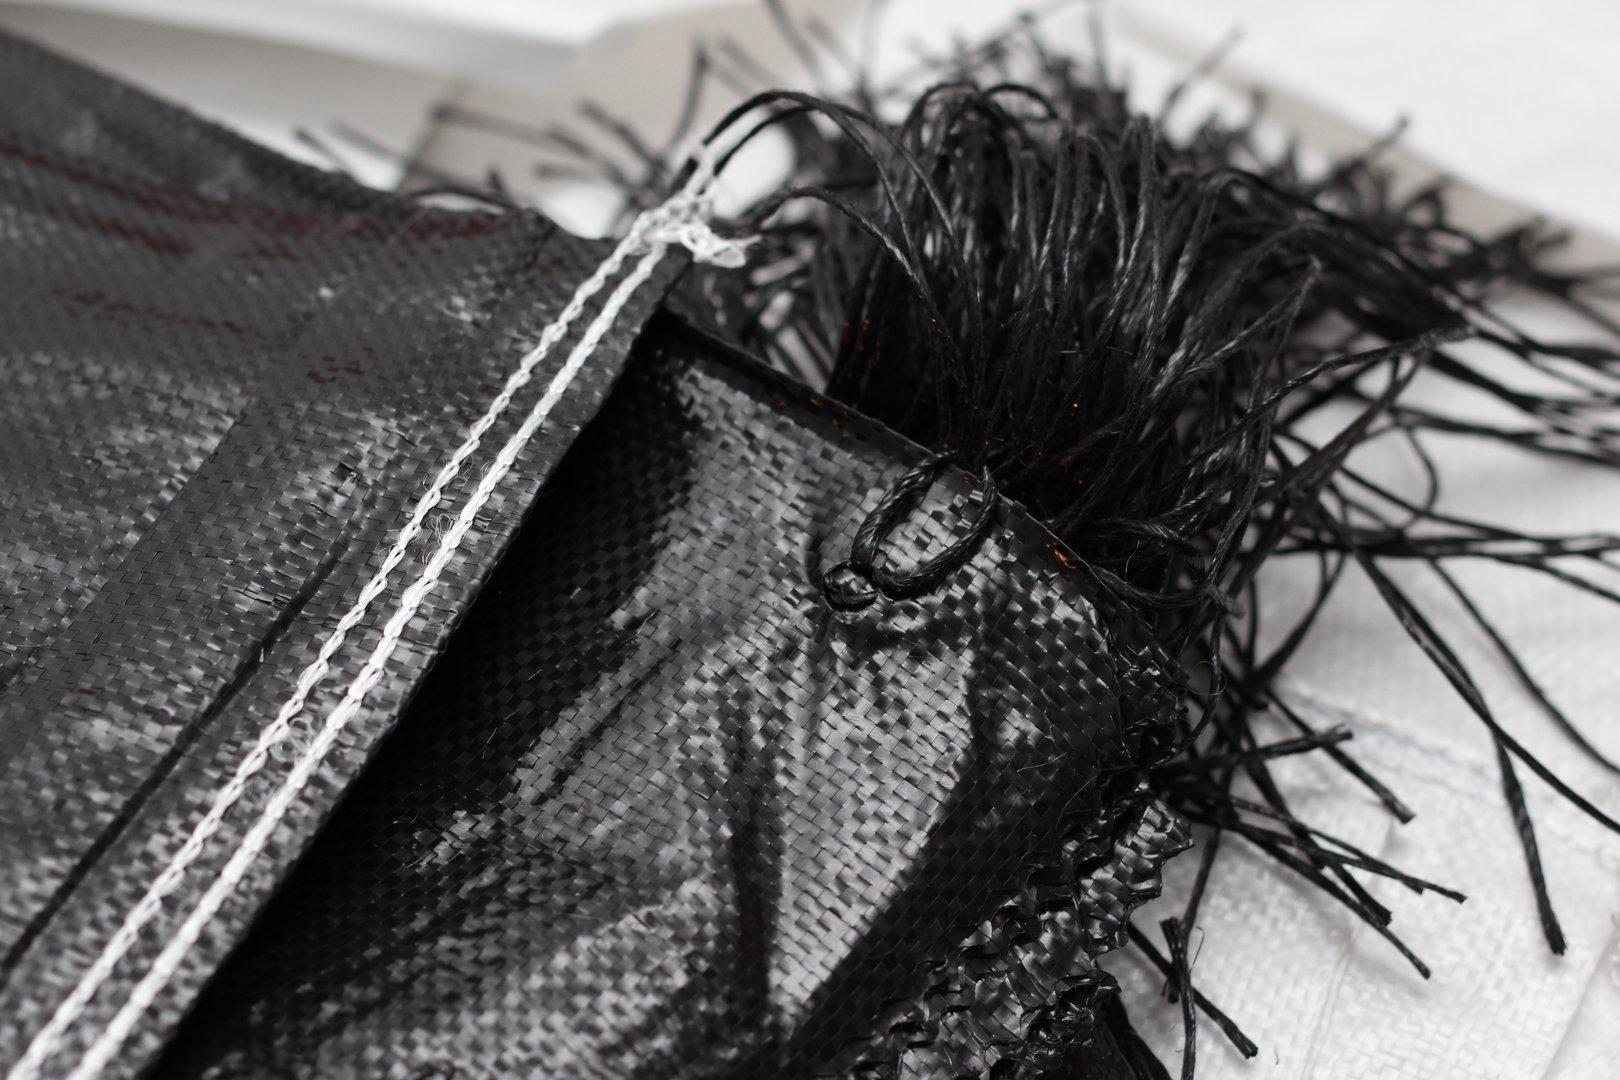 pp sandsackschlauch 25 x 100 cm erco verpackungen gmbh silosack. Black Bedroom Furniture Sets. Home Design Ideas